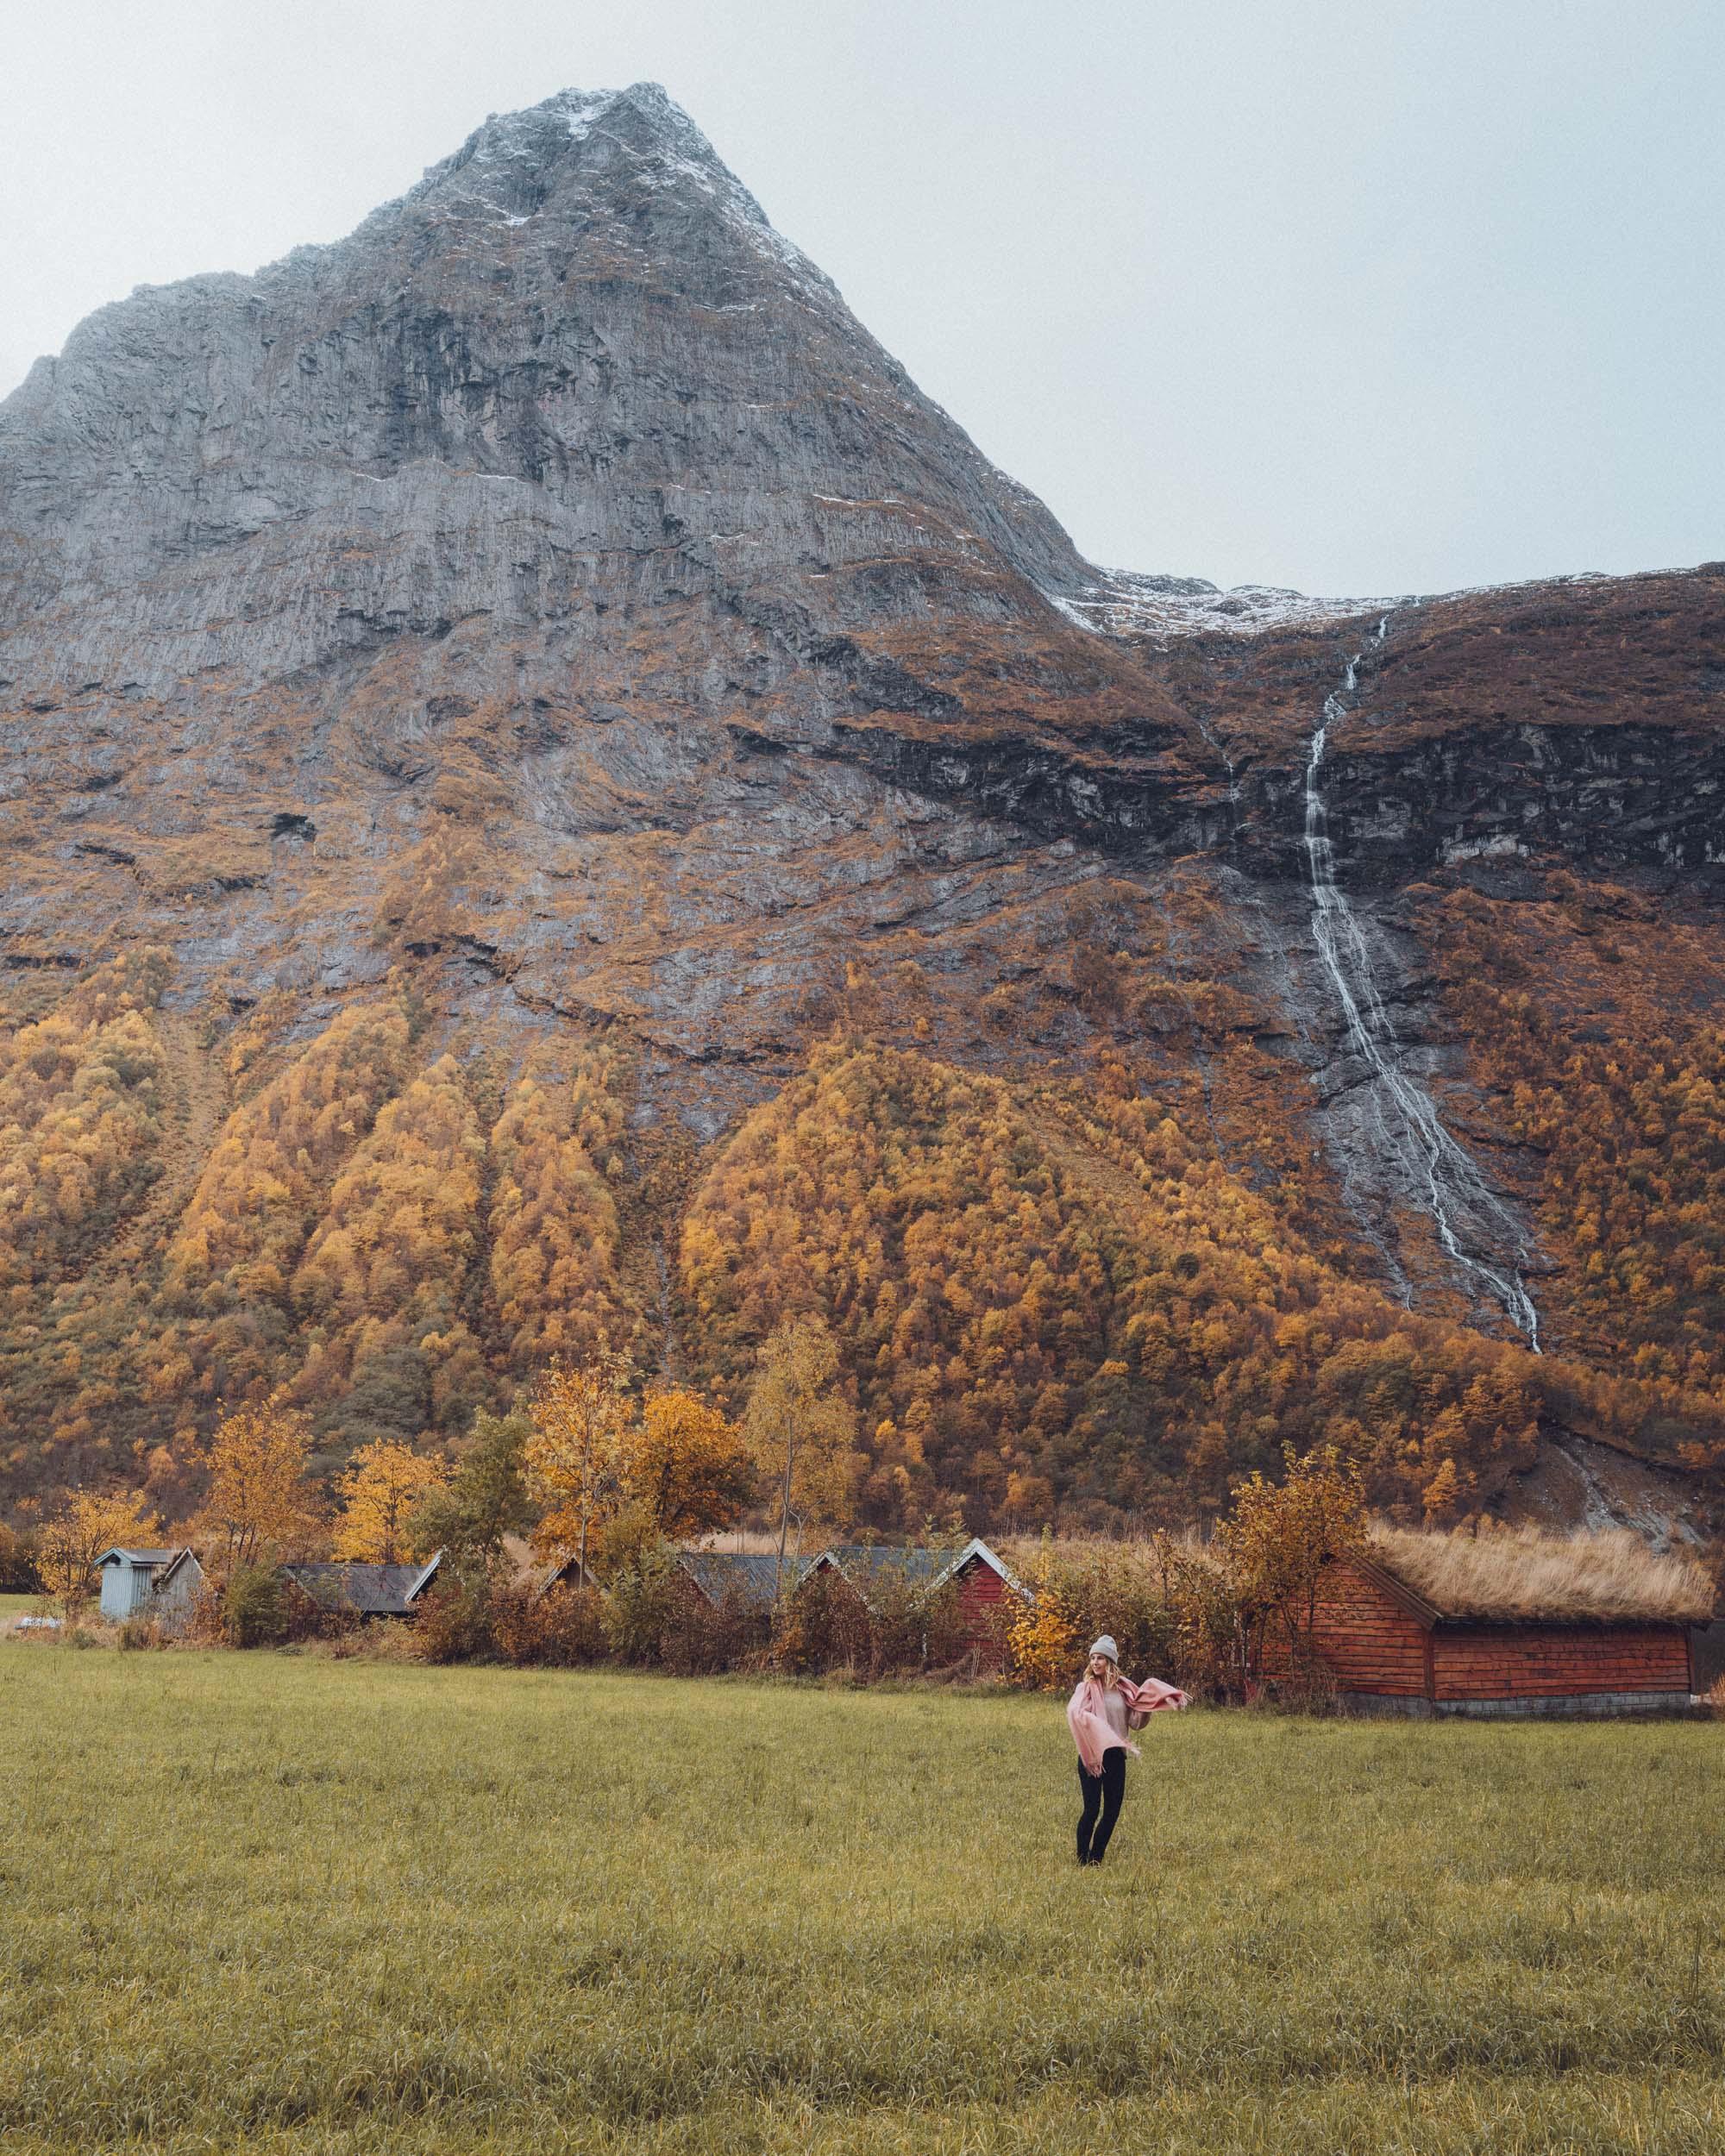 Fall colors in Norangsfjorden, Norway near Alesund